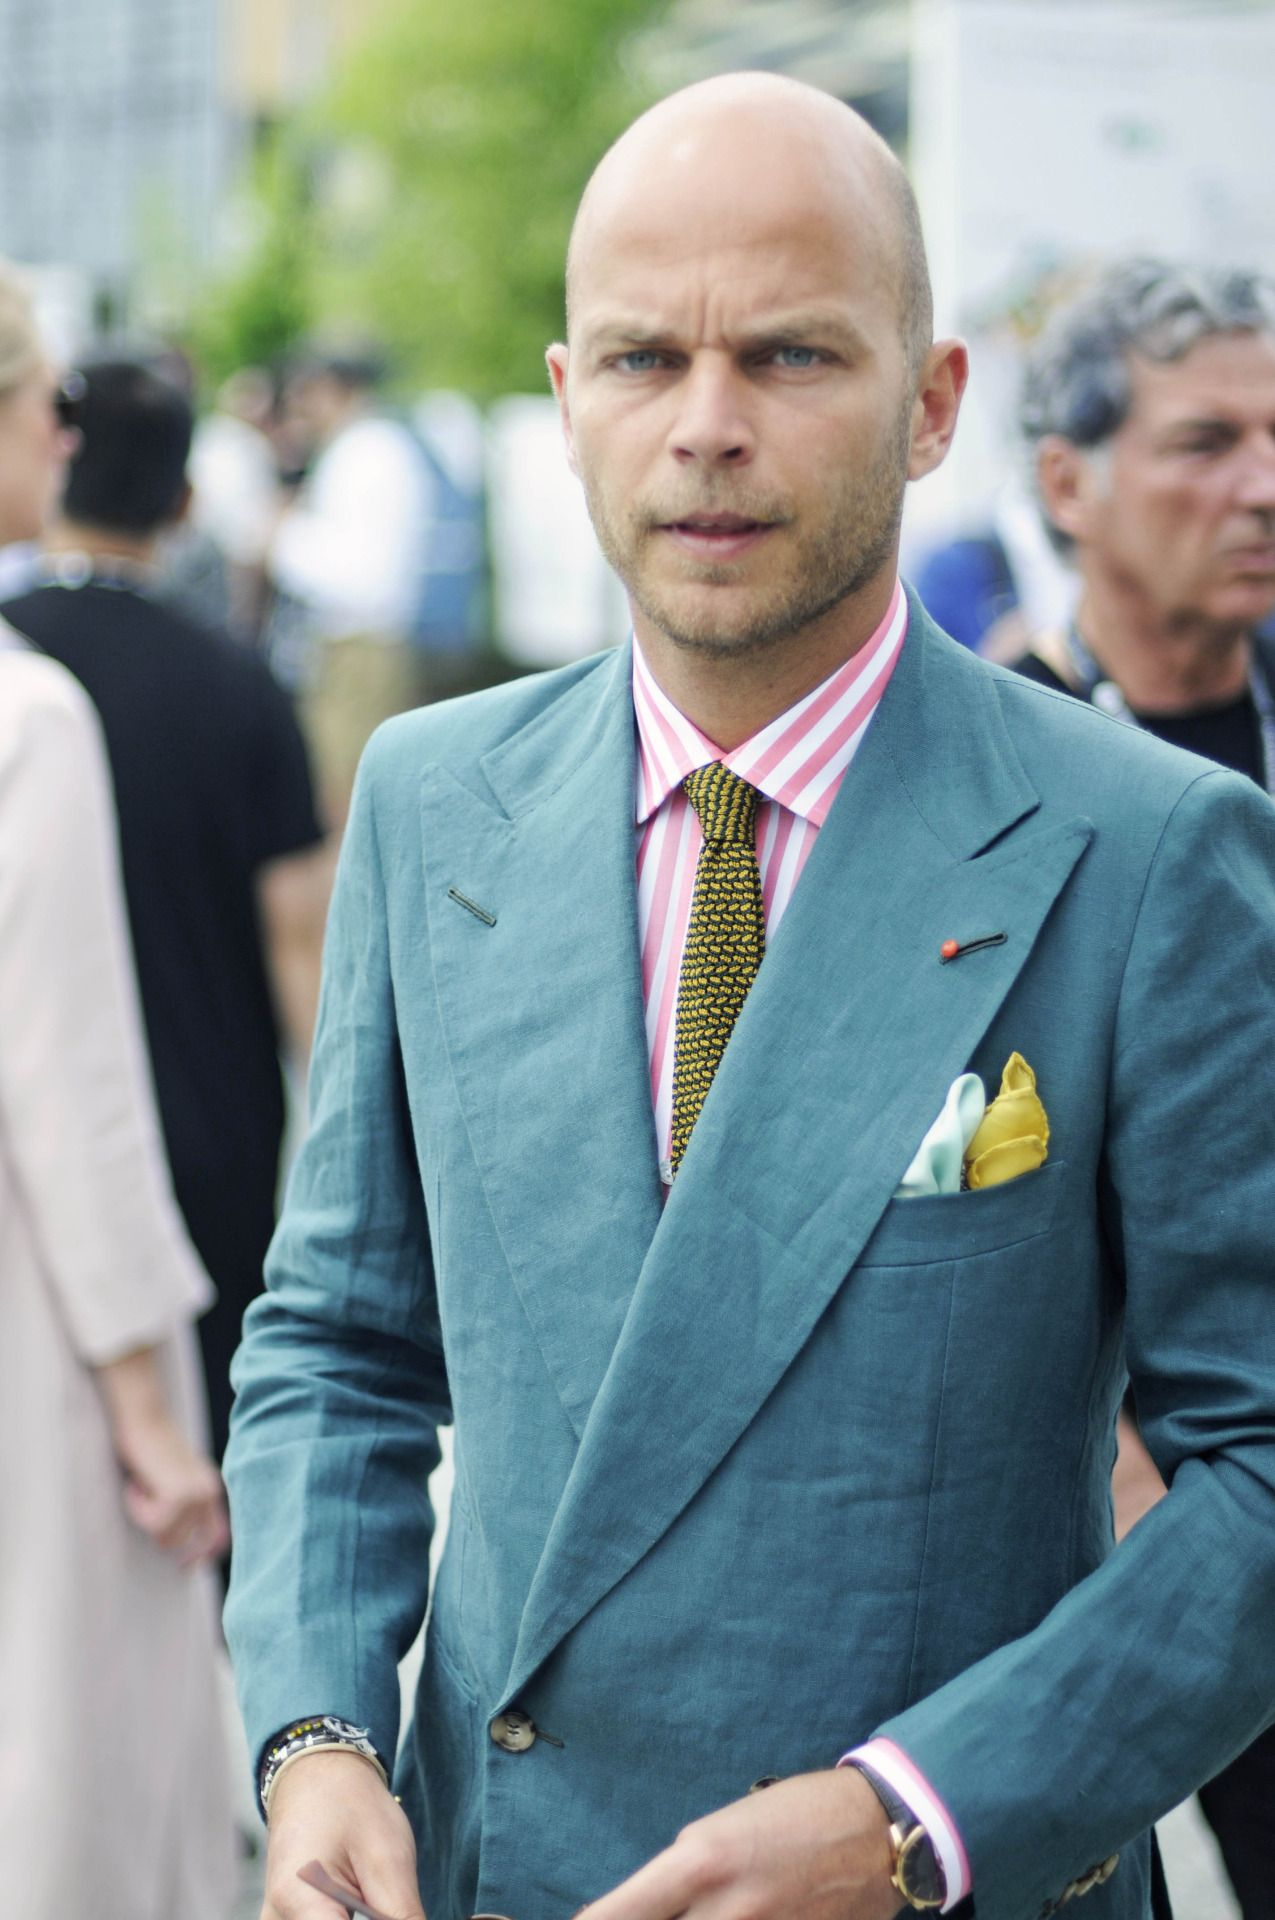 Manolo | My Style | Pinterest | Man style